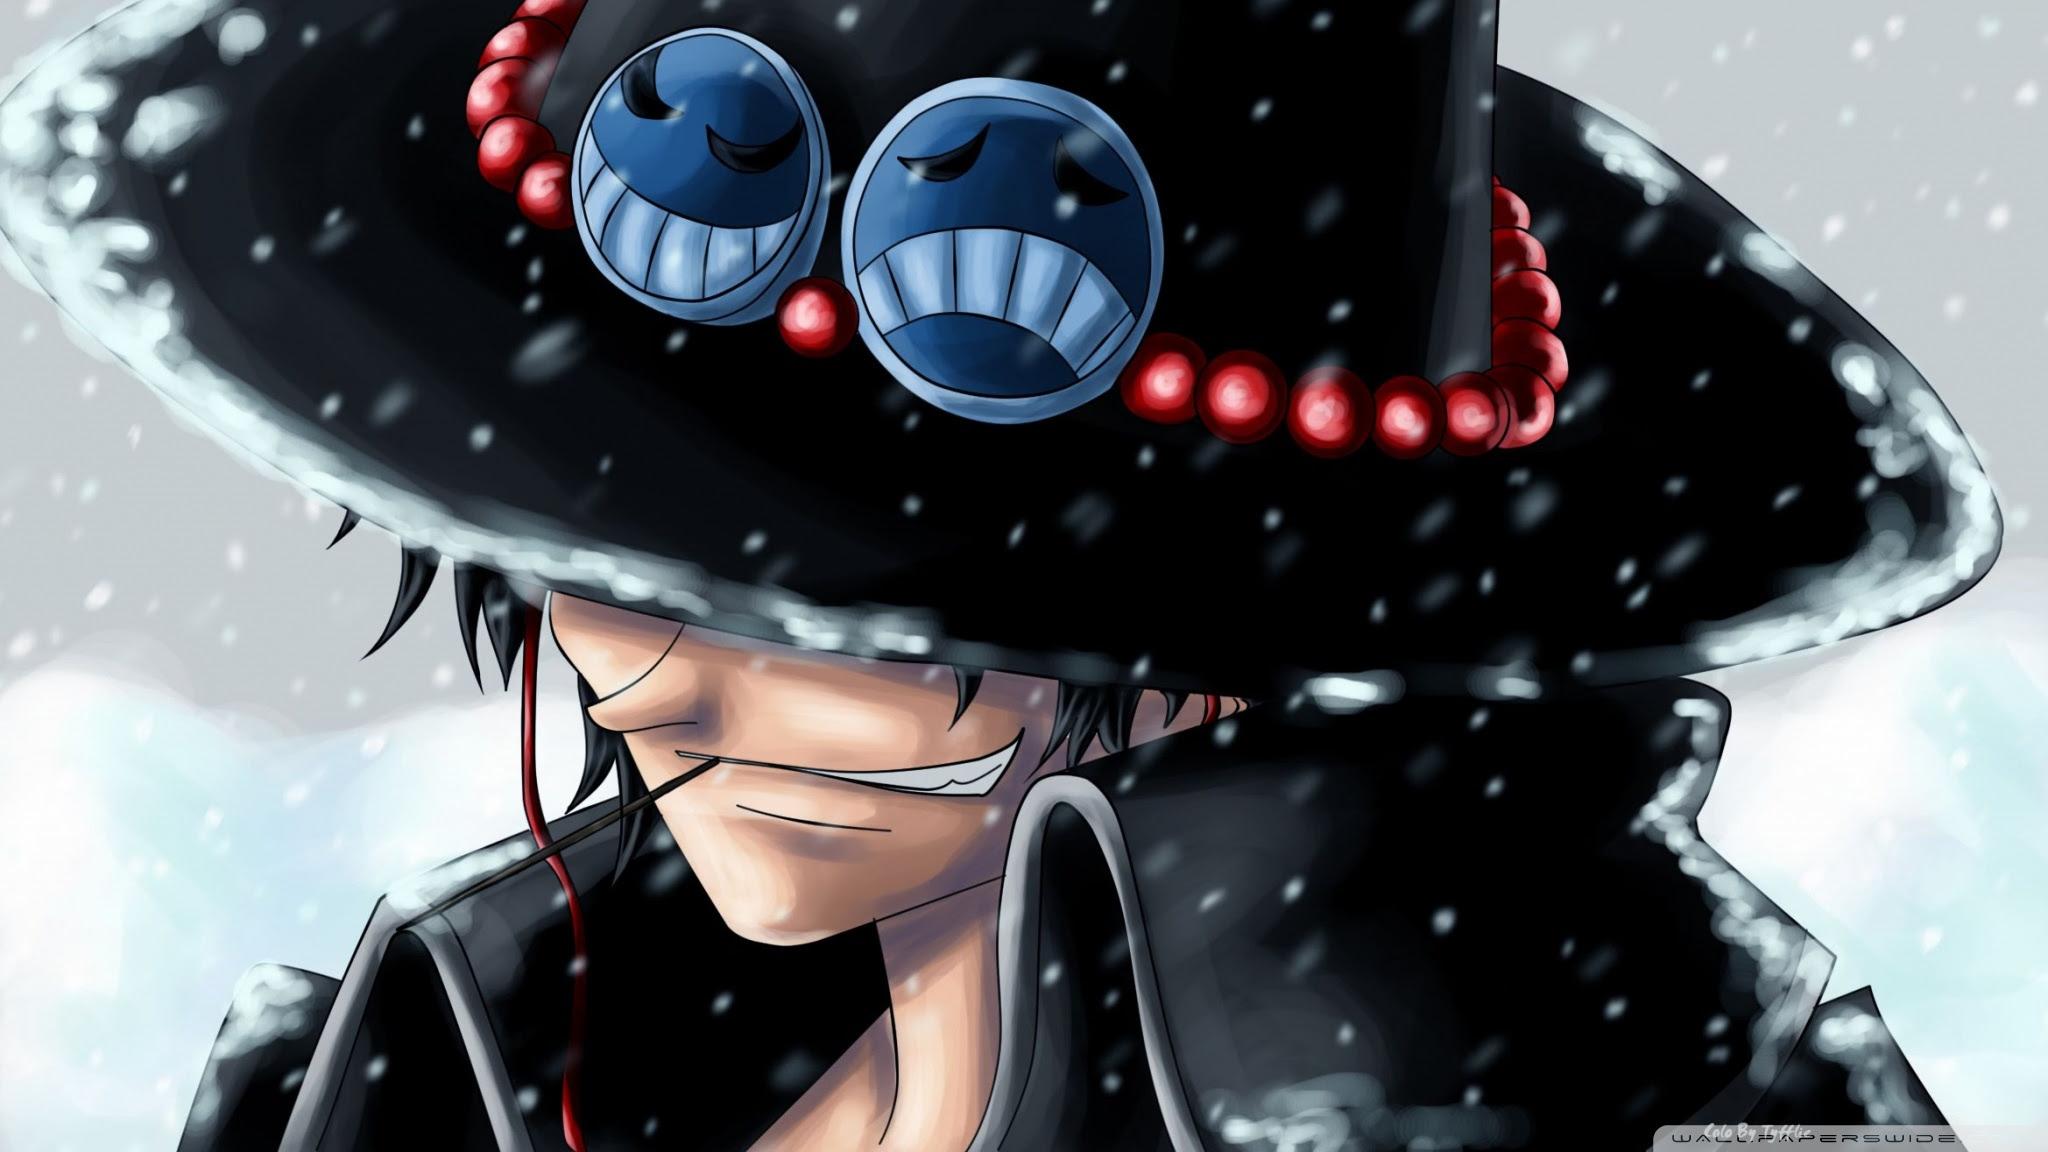 Ultra Hd Wallpaper Hd Anime One Piece Gambarku